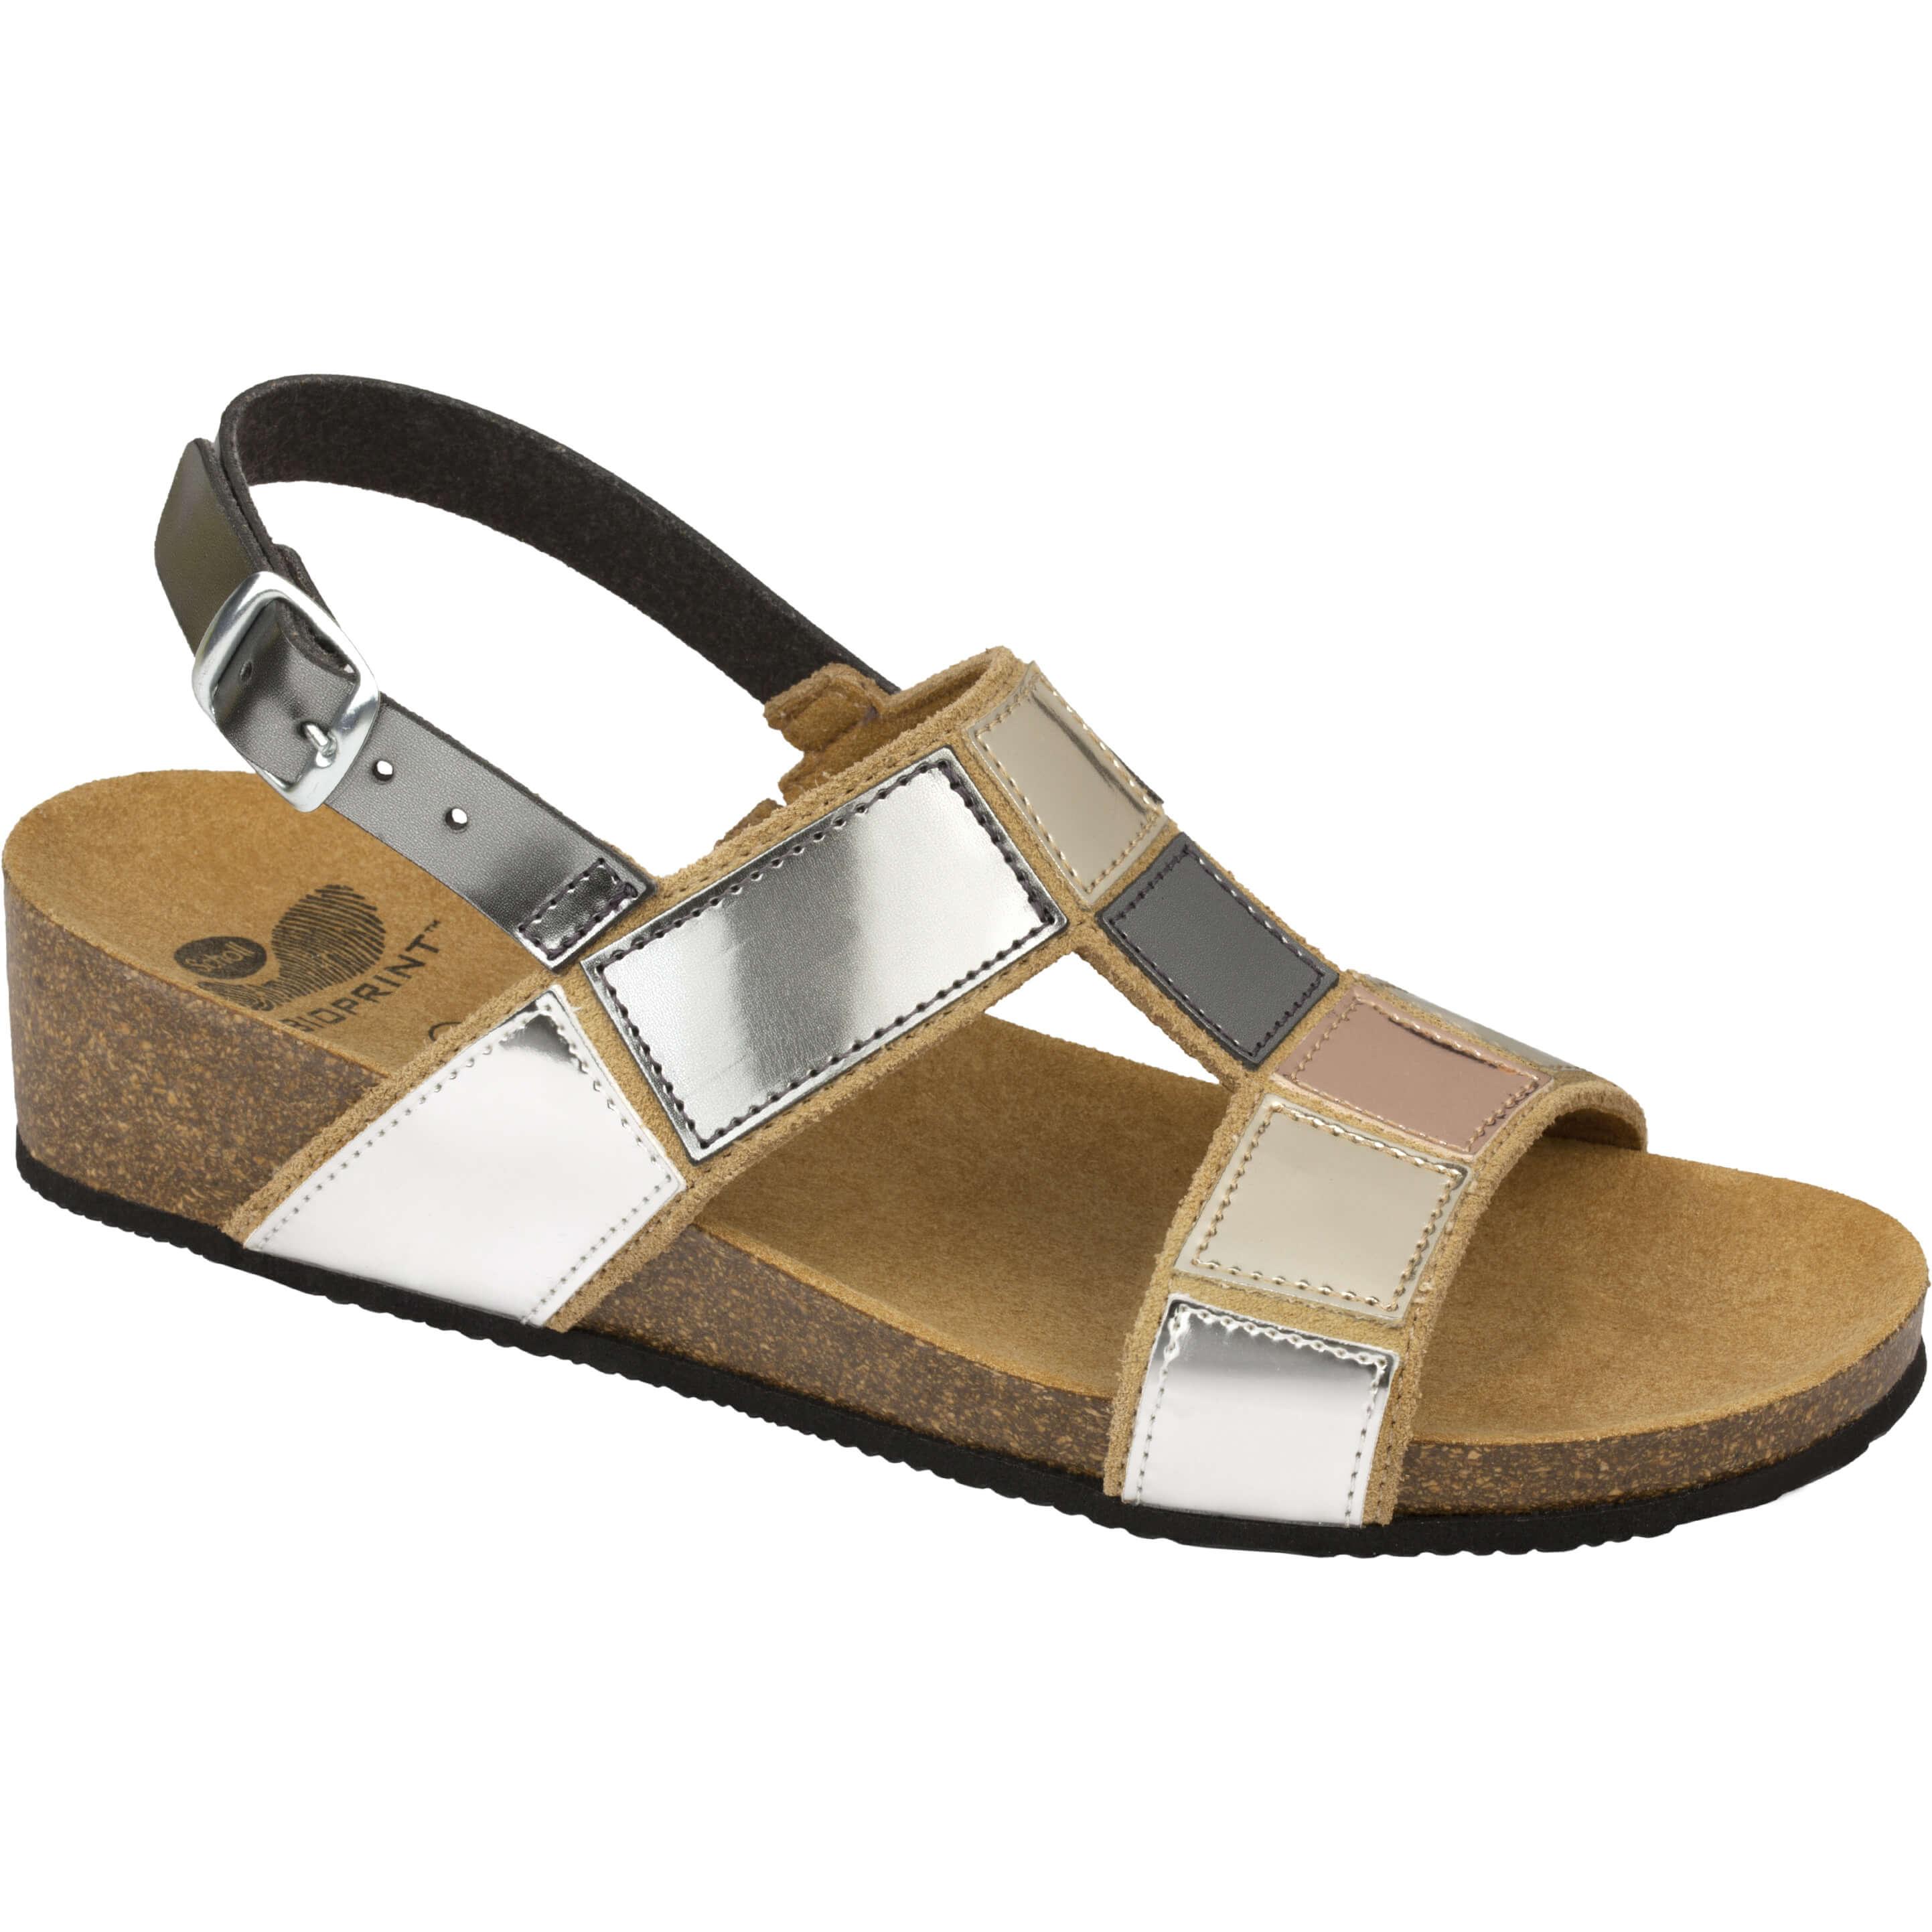 ecc6e652e5a Dr Scholl Shoes Almira Multi ΝΕΟ Γυναικεία Ανατομικά Παπούτσια Χαρίζουν  Σωστή Στάση & Φυσικό Χωρίς Πόνο